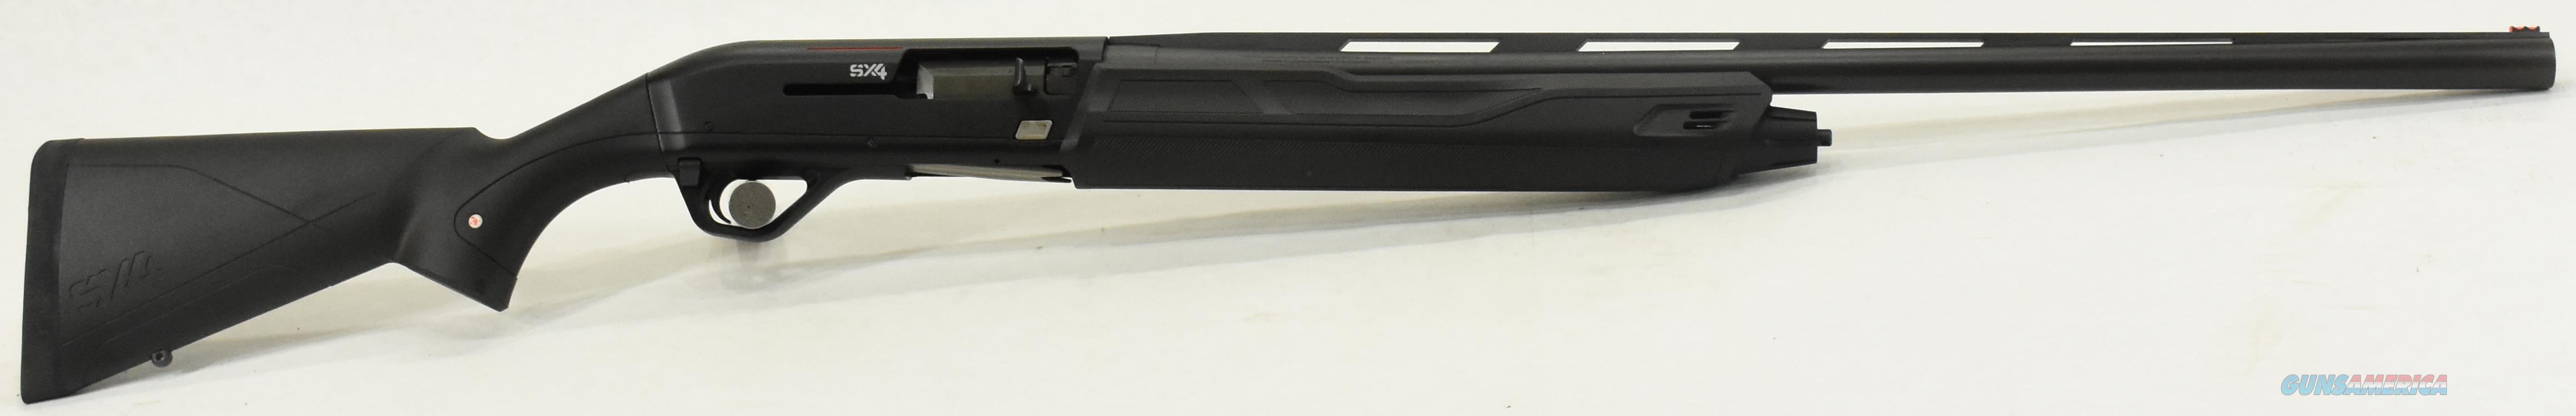 SX4 Compact Black 12Ga 26-3In  511230391  Guns > Shotguns > Winchester Shotguns - Modern > Autoloaders > Hunting